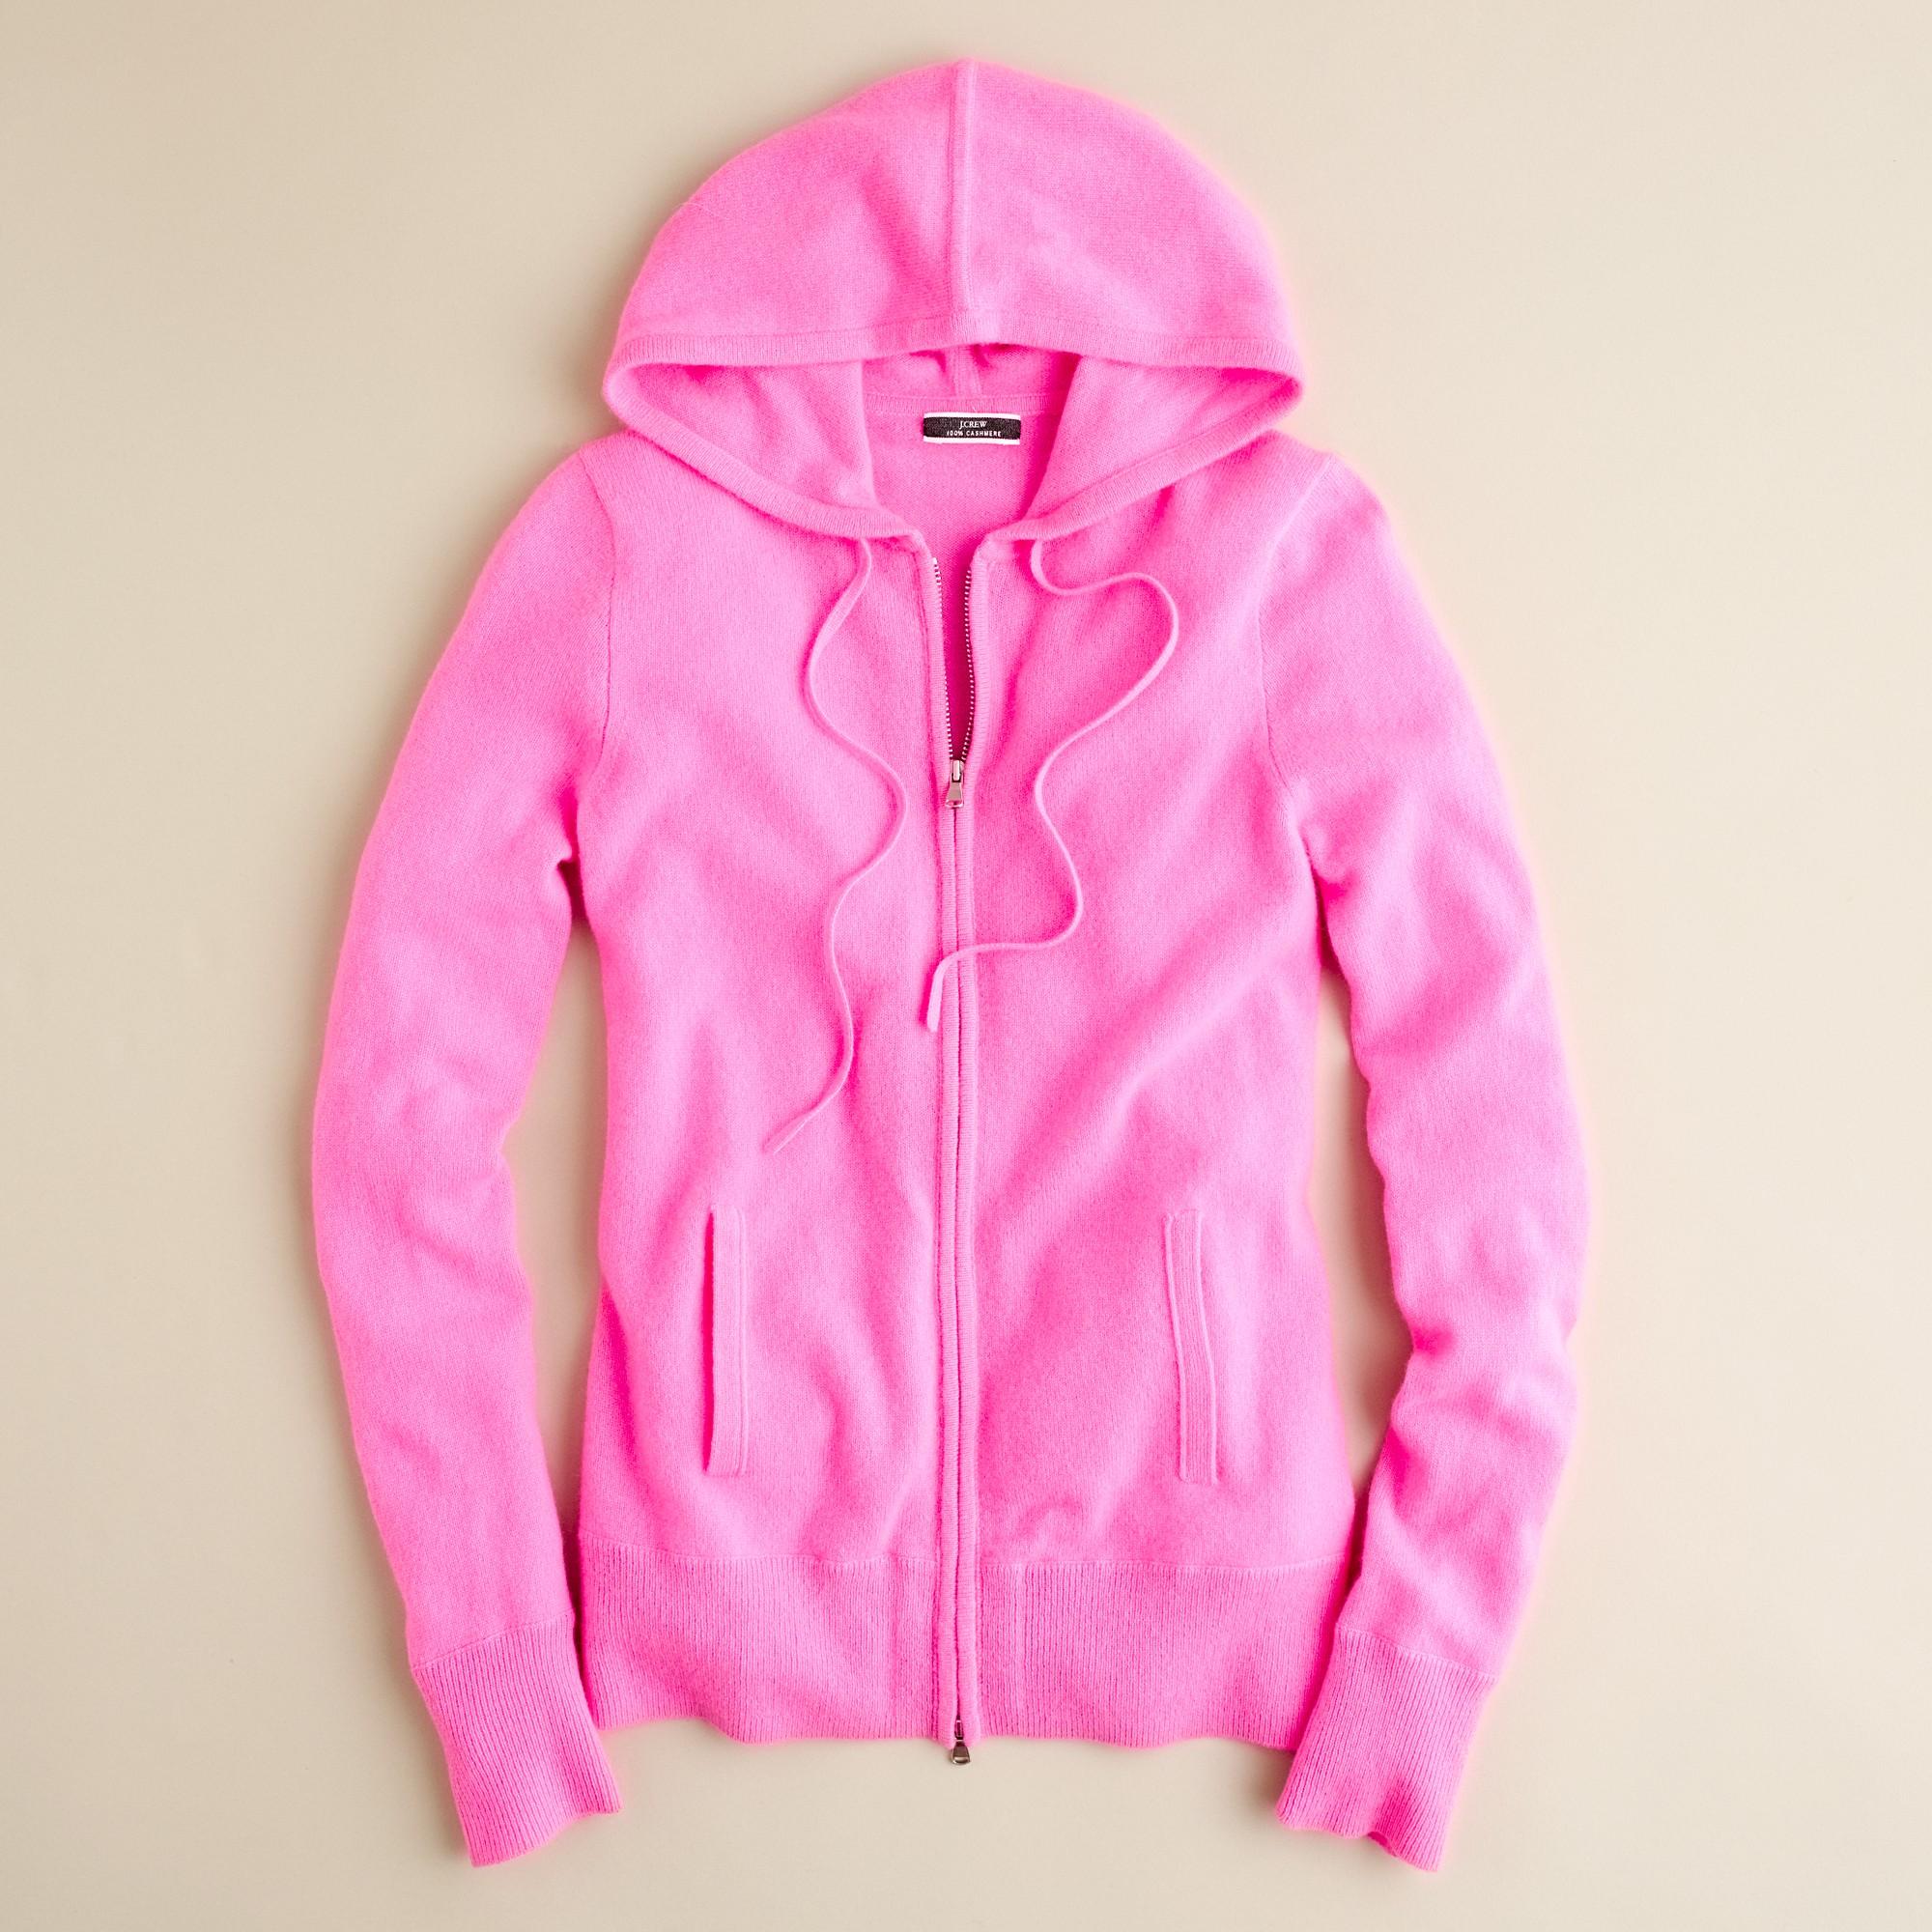 J.crew Cashmere Zip-front Hoodie in Pink | Lyst